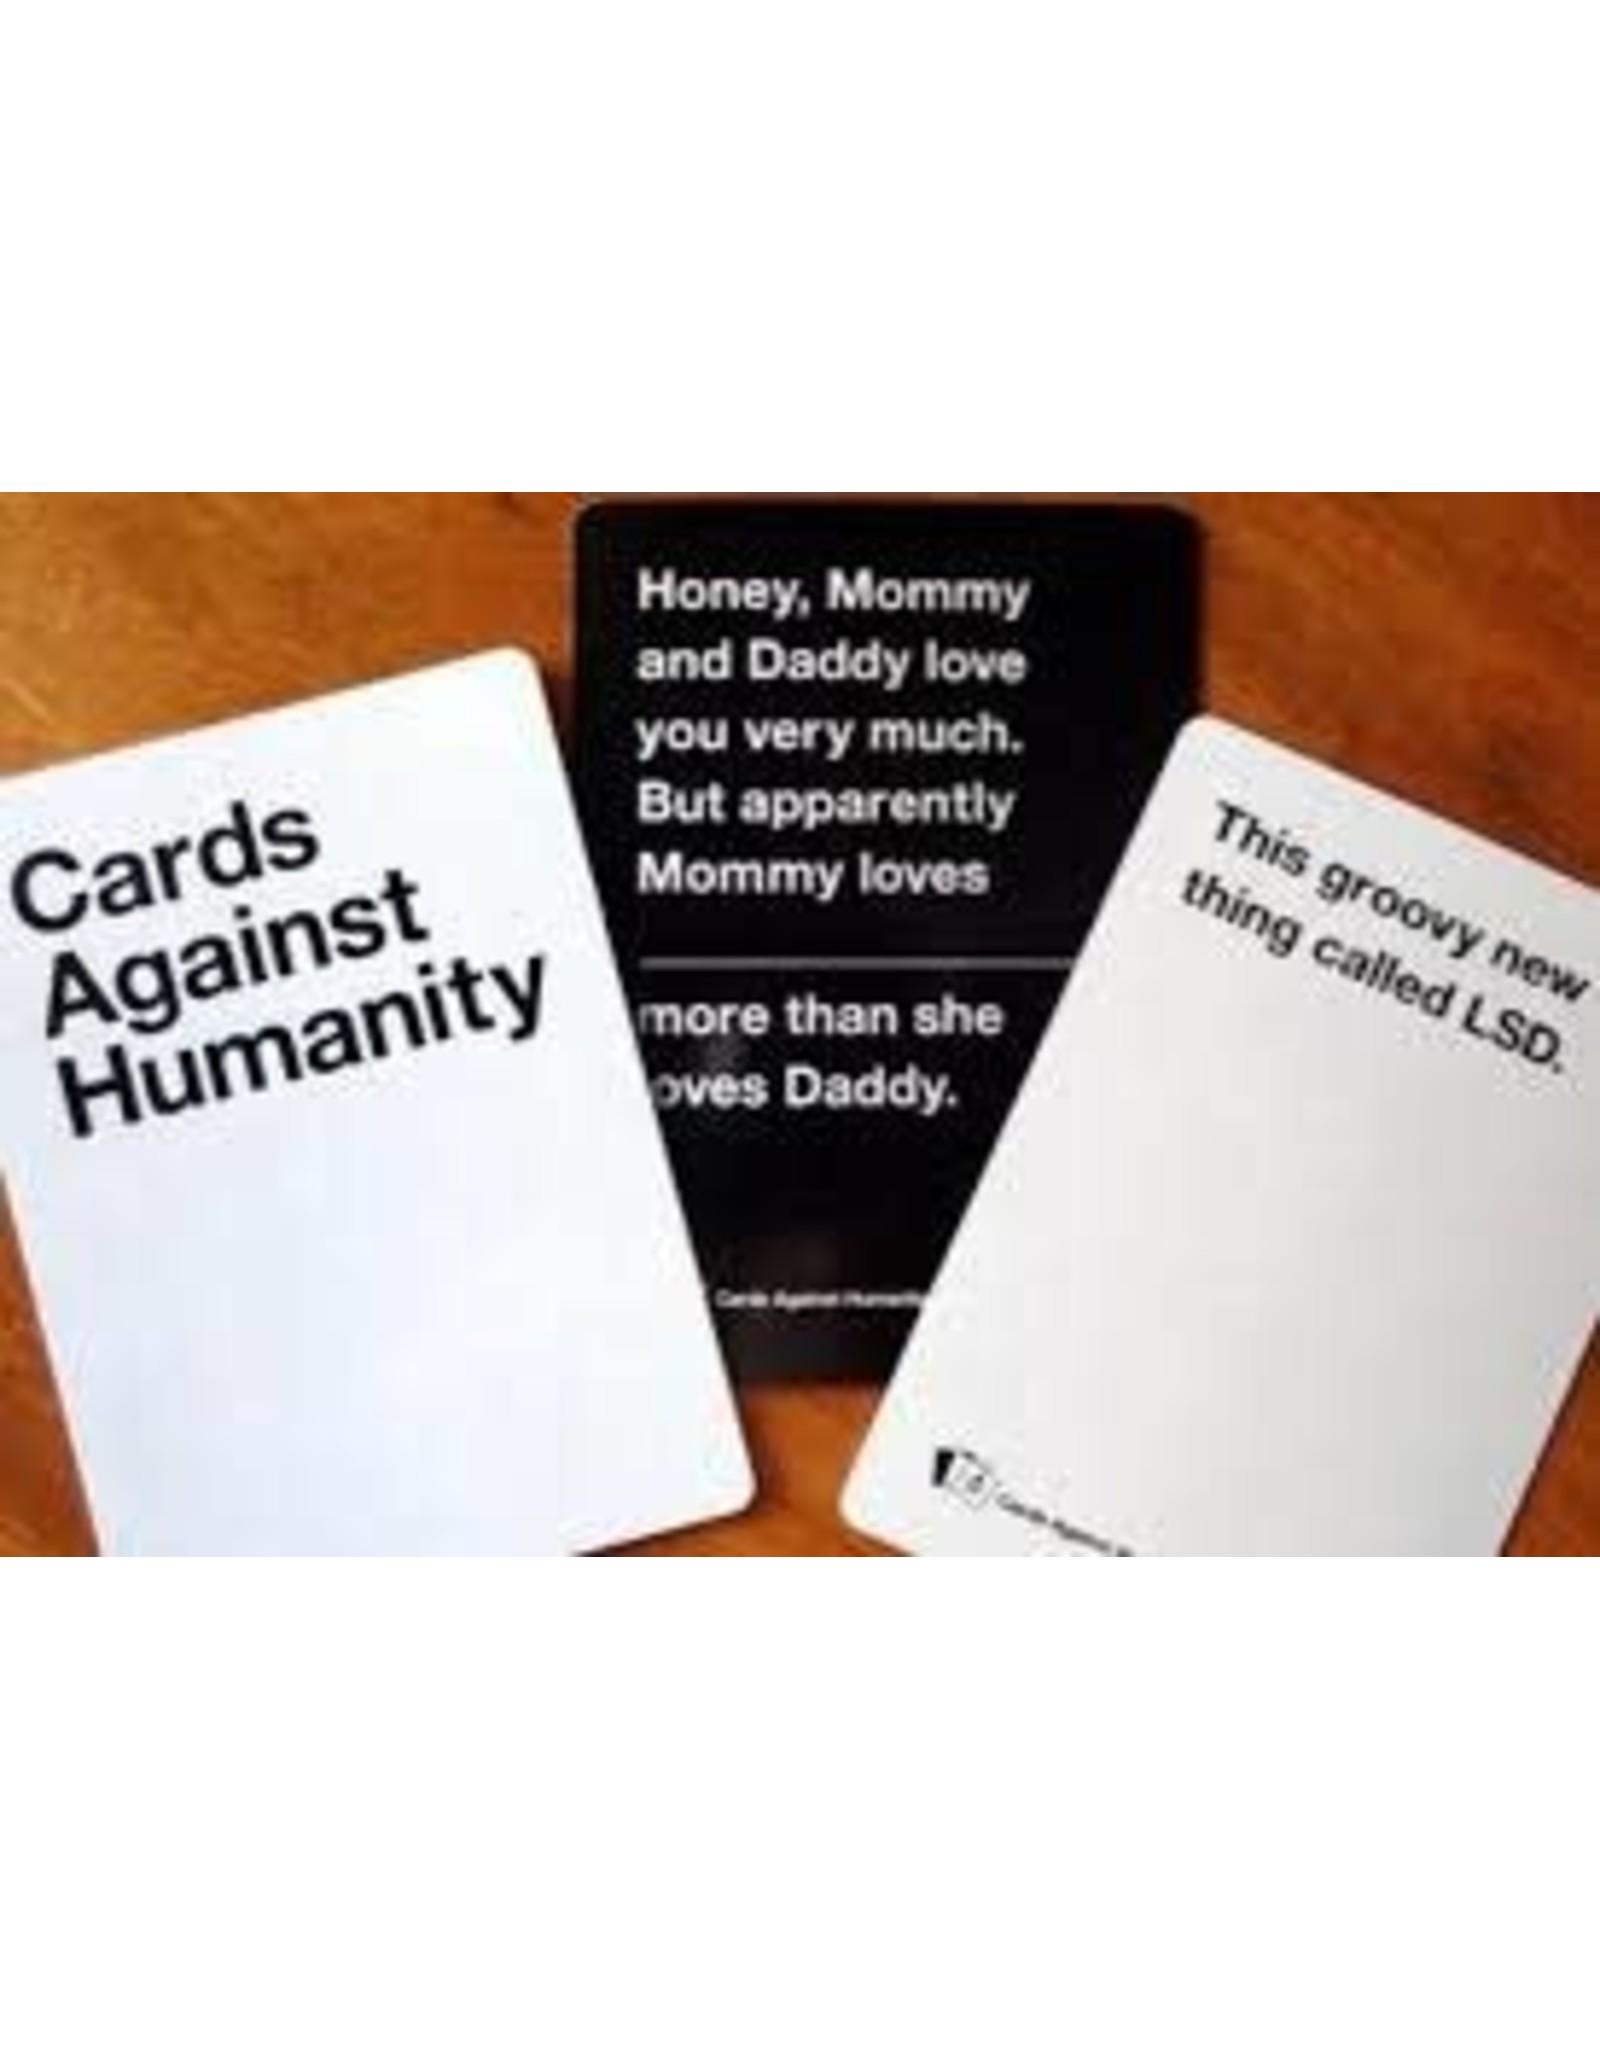 KICKSTARTER CARDS AGAINST HUMANITY